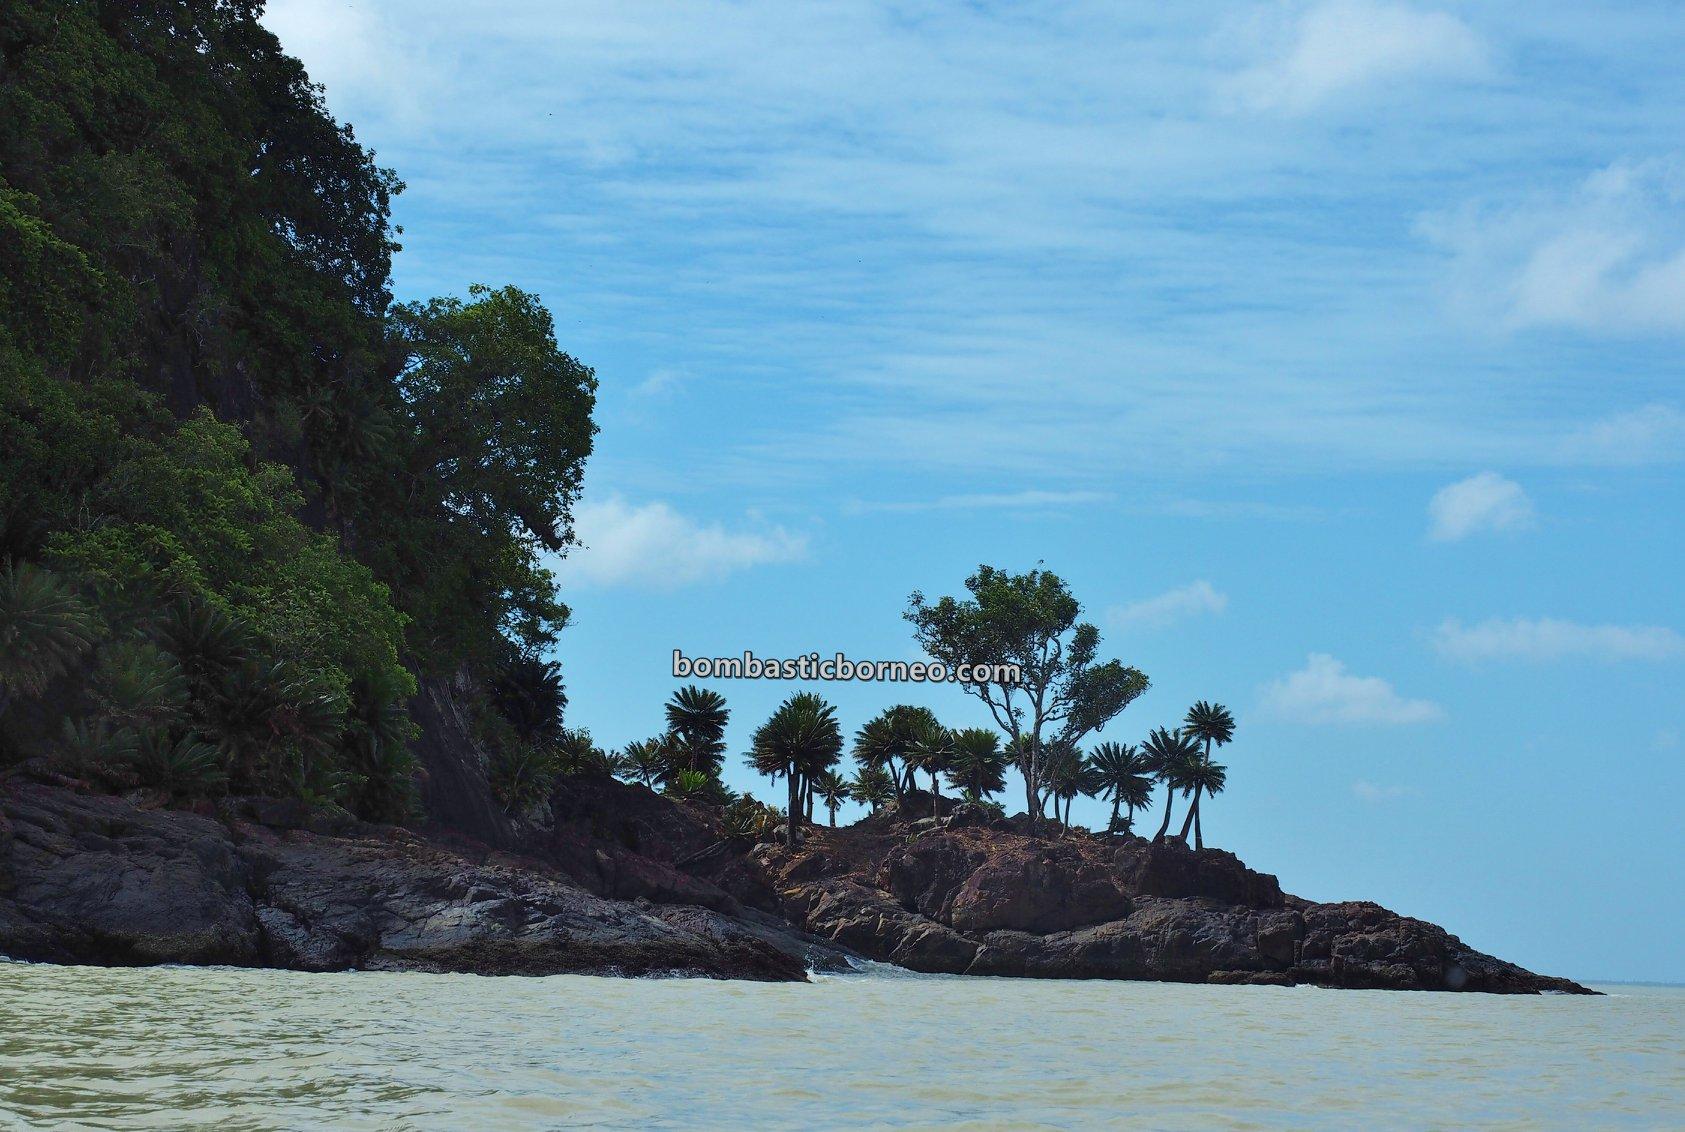 island, adventure, nature, mussel, kerang, Nelayan, fishing, Jawai Selatan, wisata alam, travel guide, destination, Borneo, 跨境婆罗洲游踪, 印尼西加里曼丹, 三发马来渔村